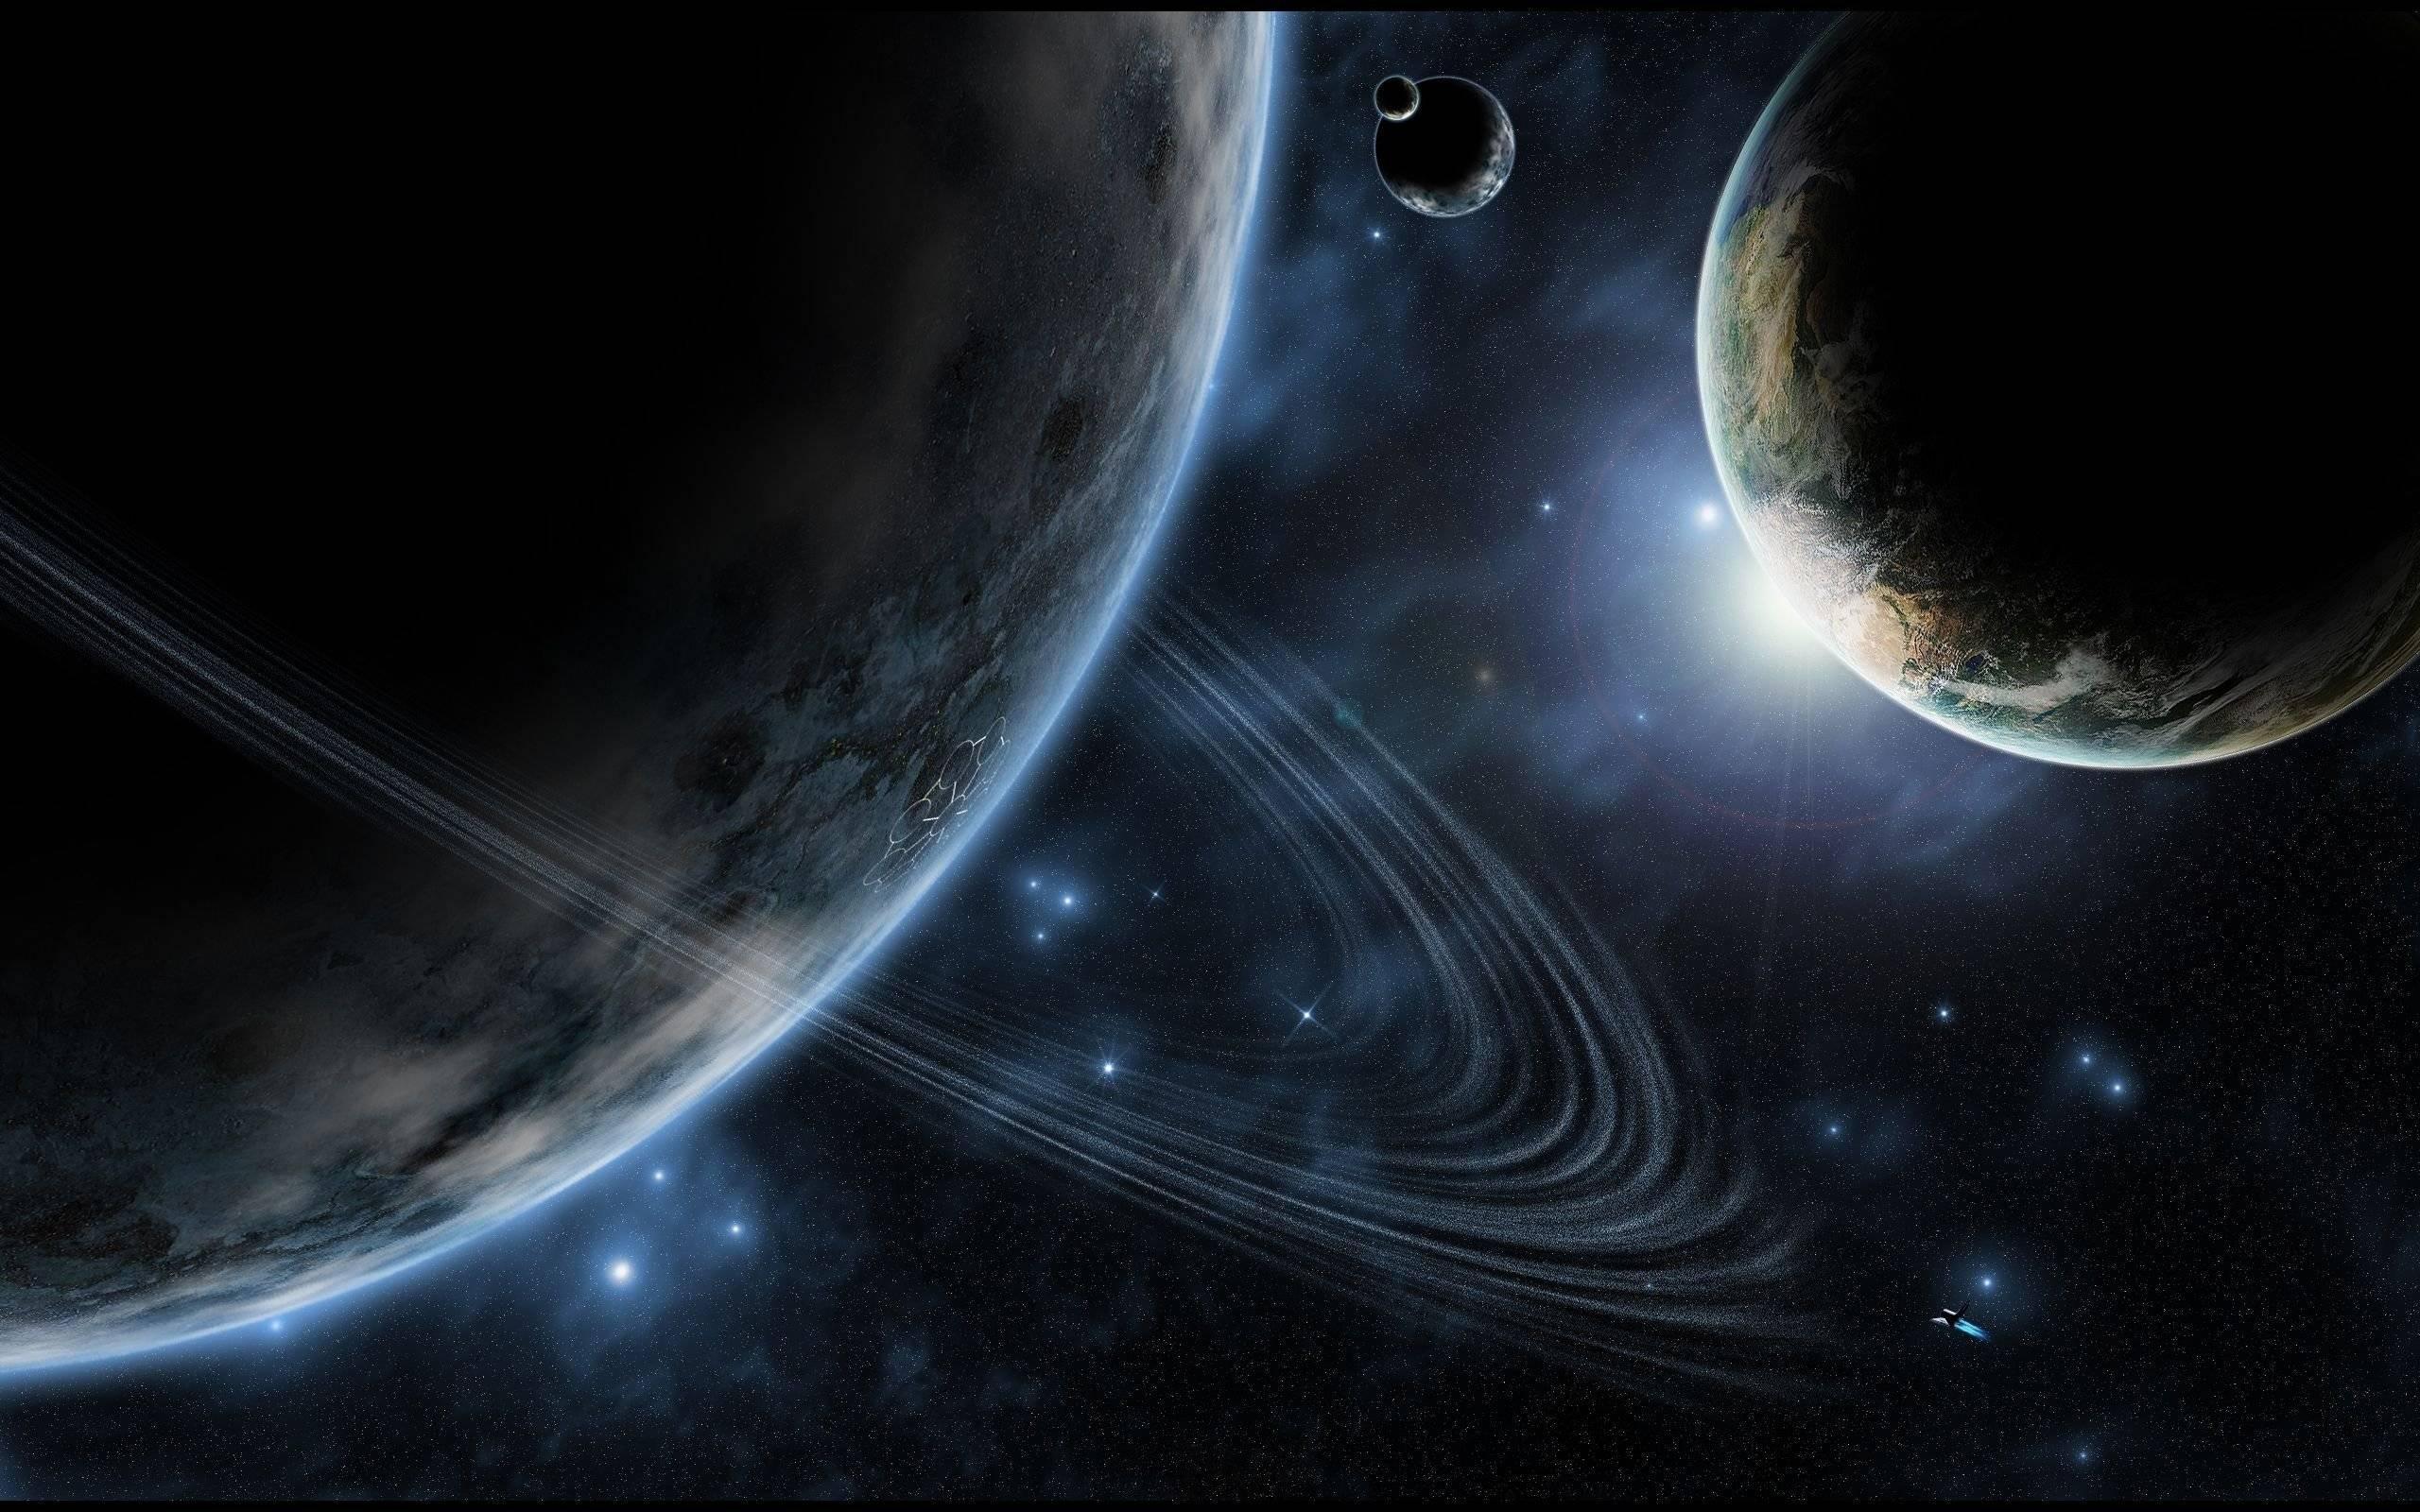 [44+] 8K Space Wallpaper on WallpaperSafari